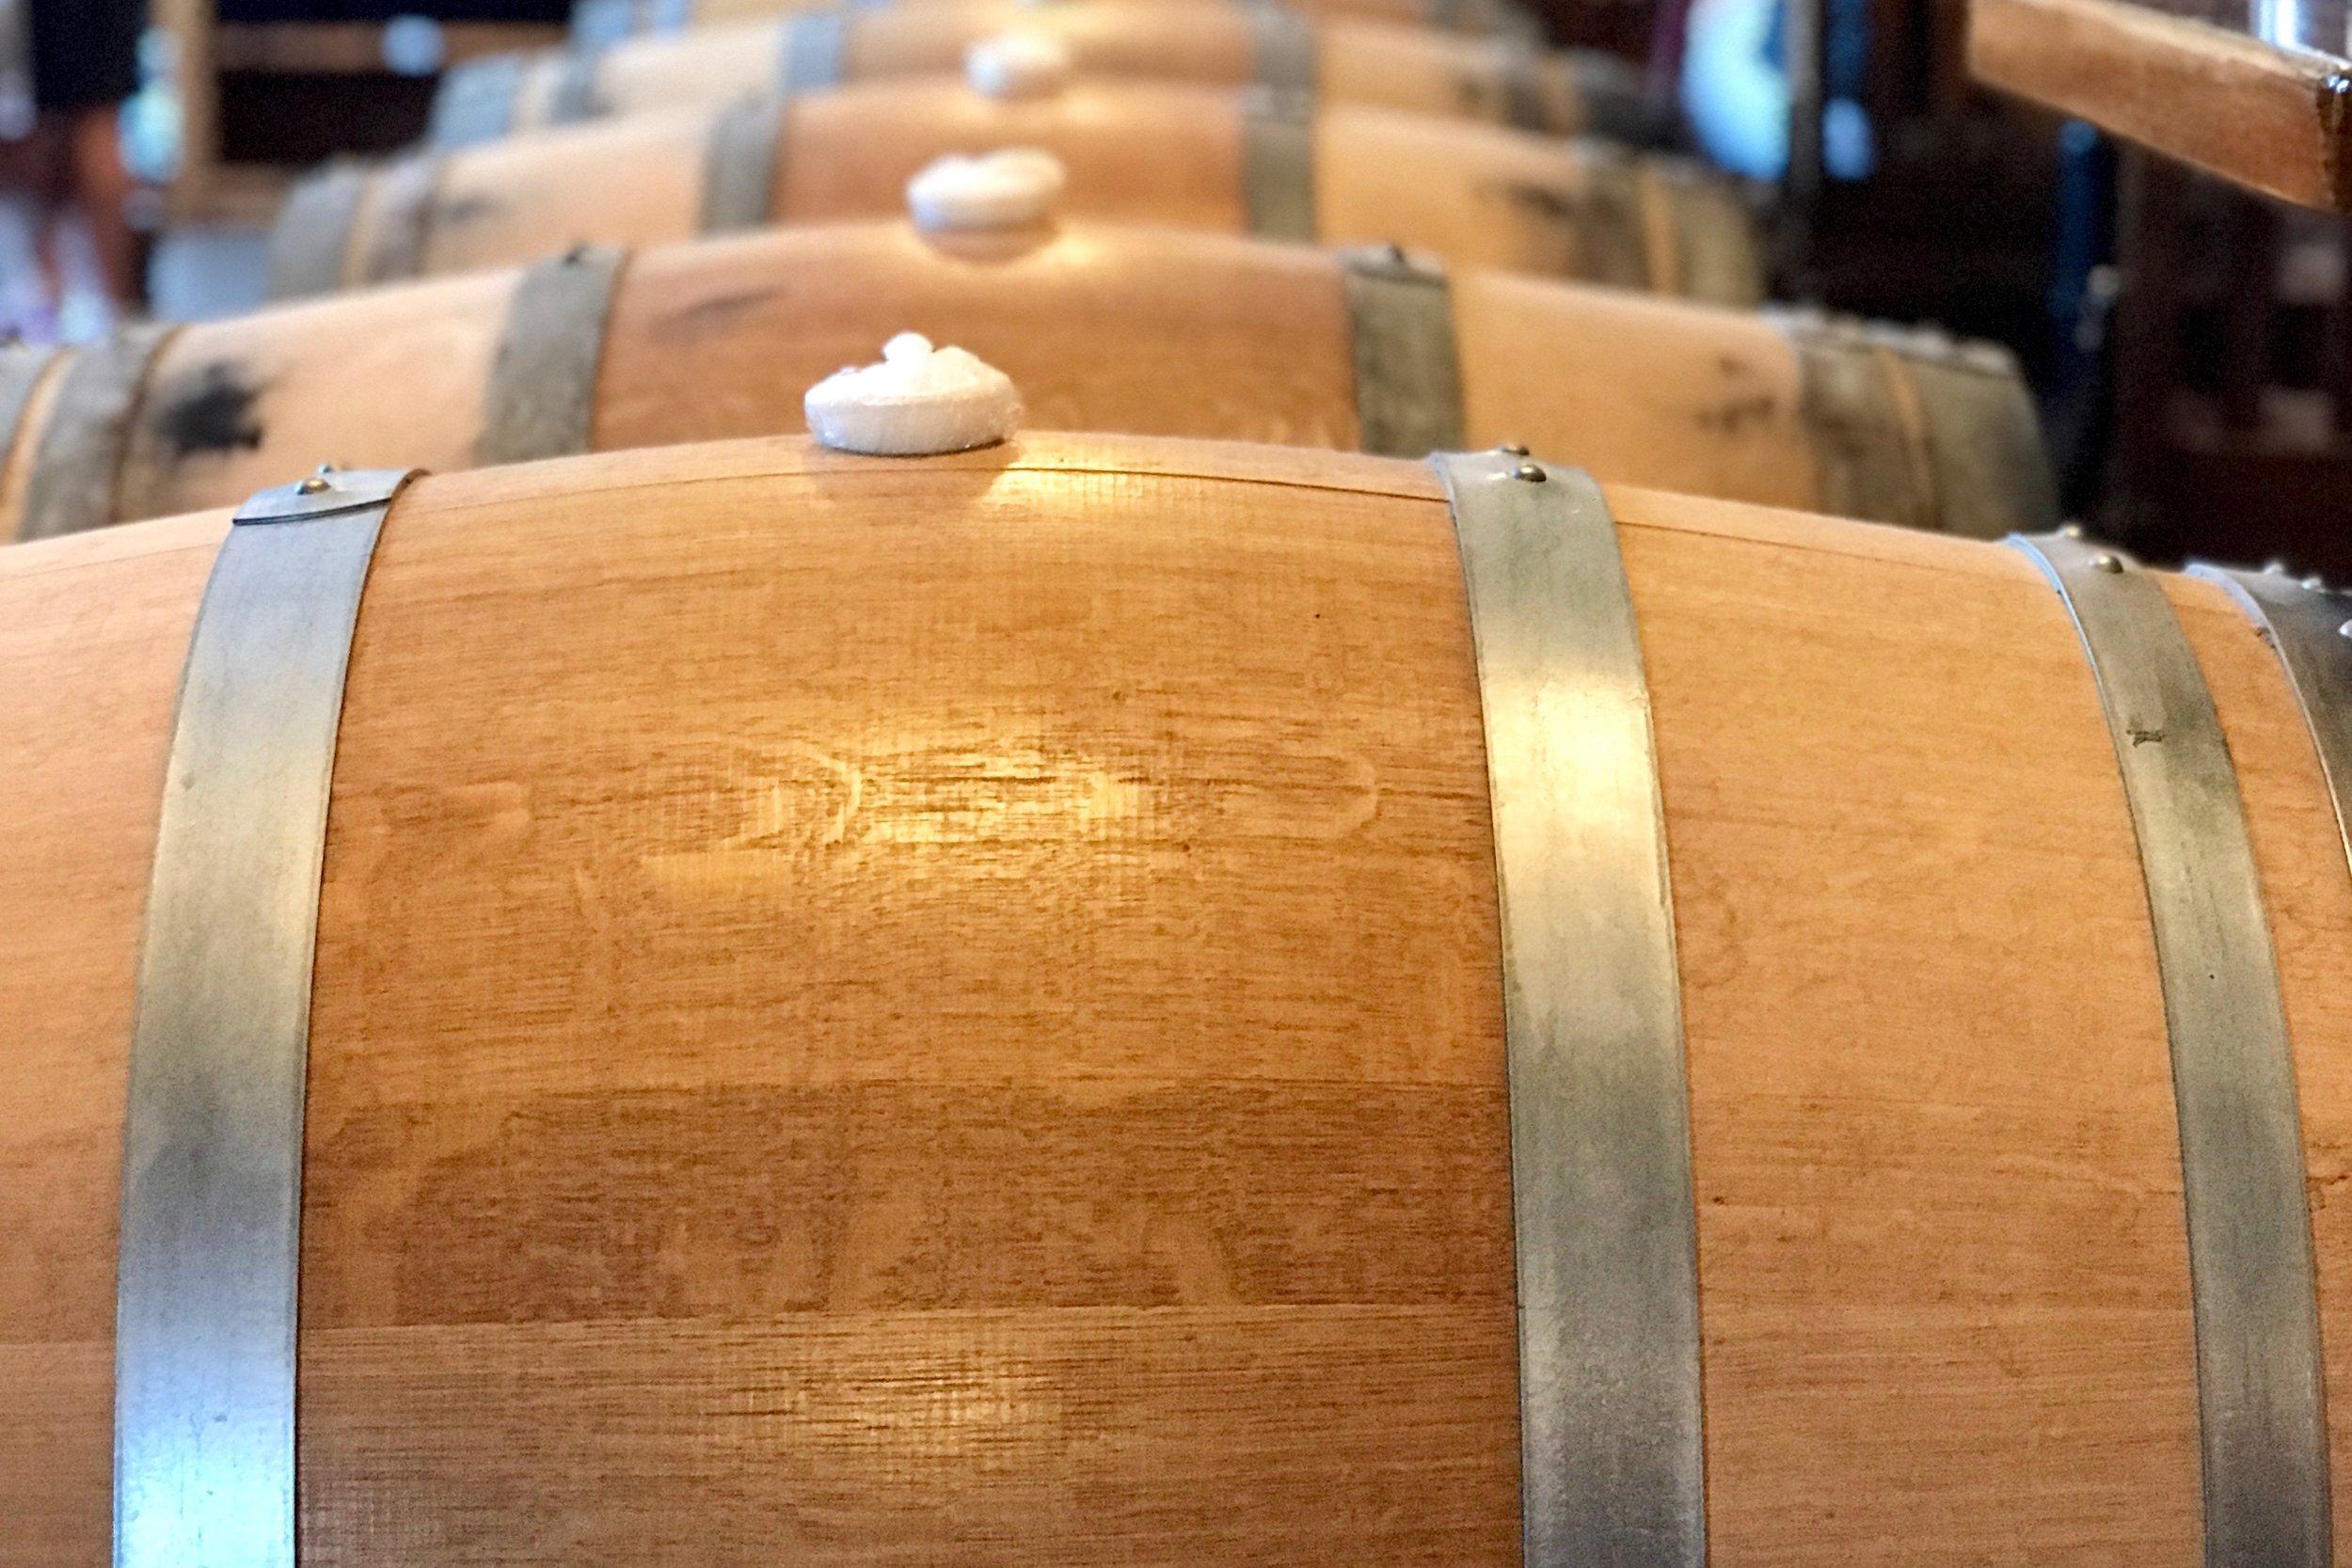 Monroeville Vineyards & Winery